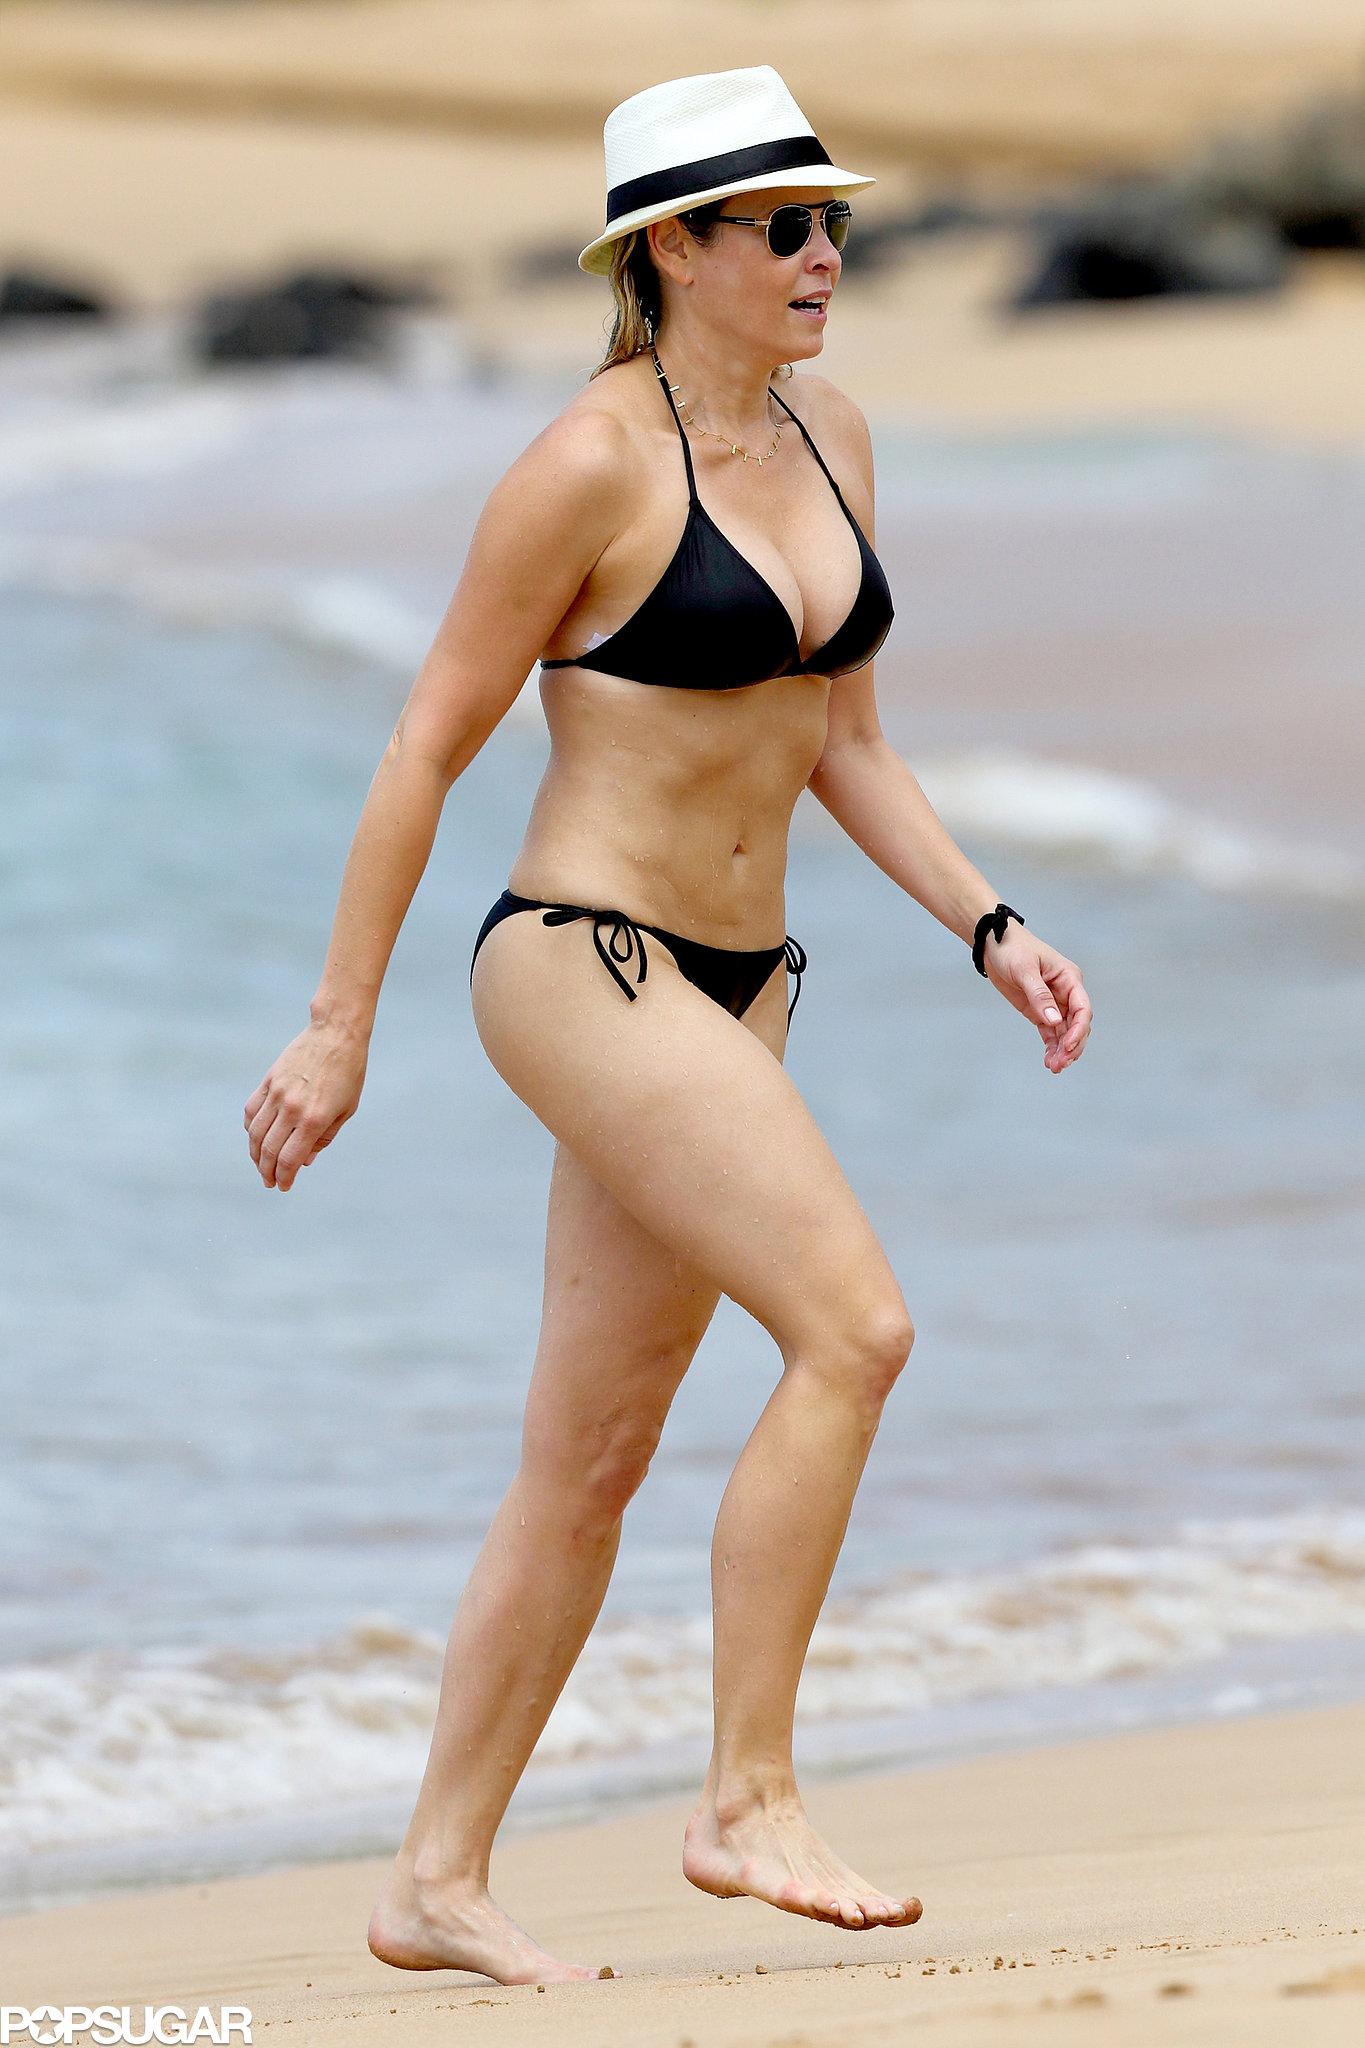 Chelsea Handler showed off her bikini body while at the beach in Hawaii.